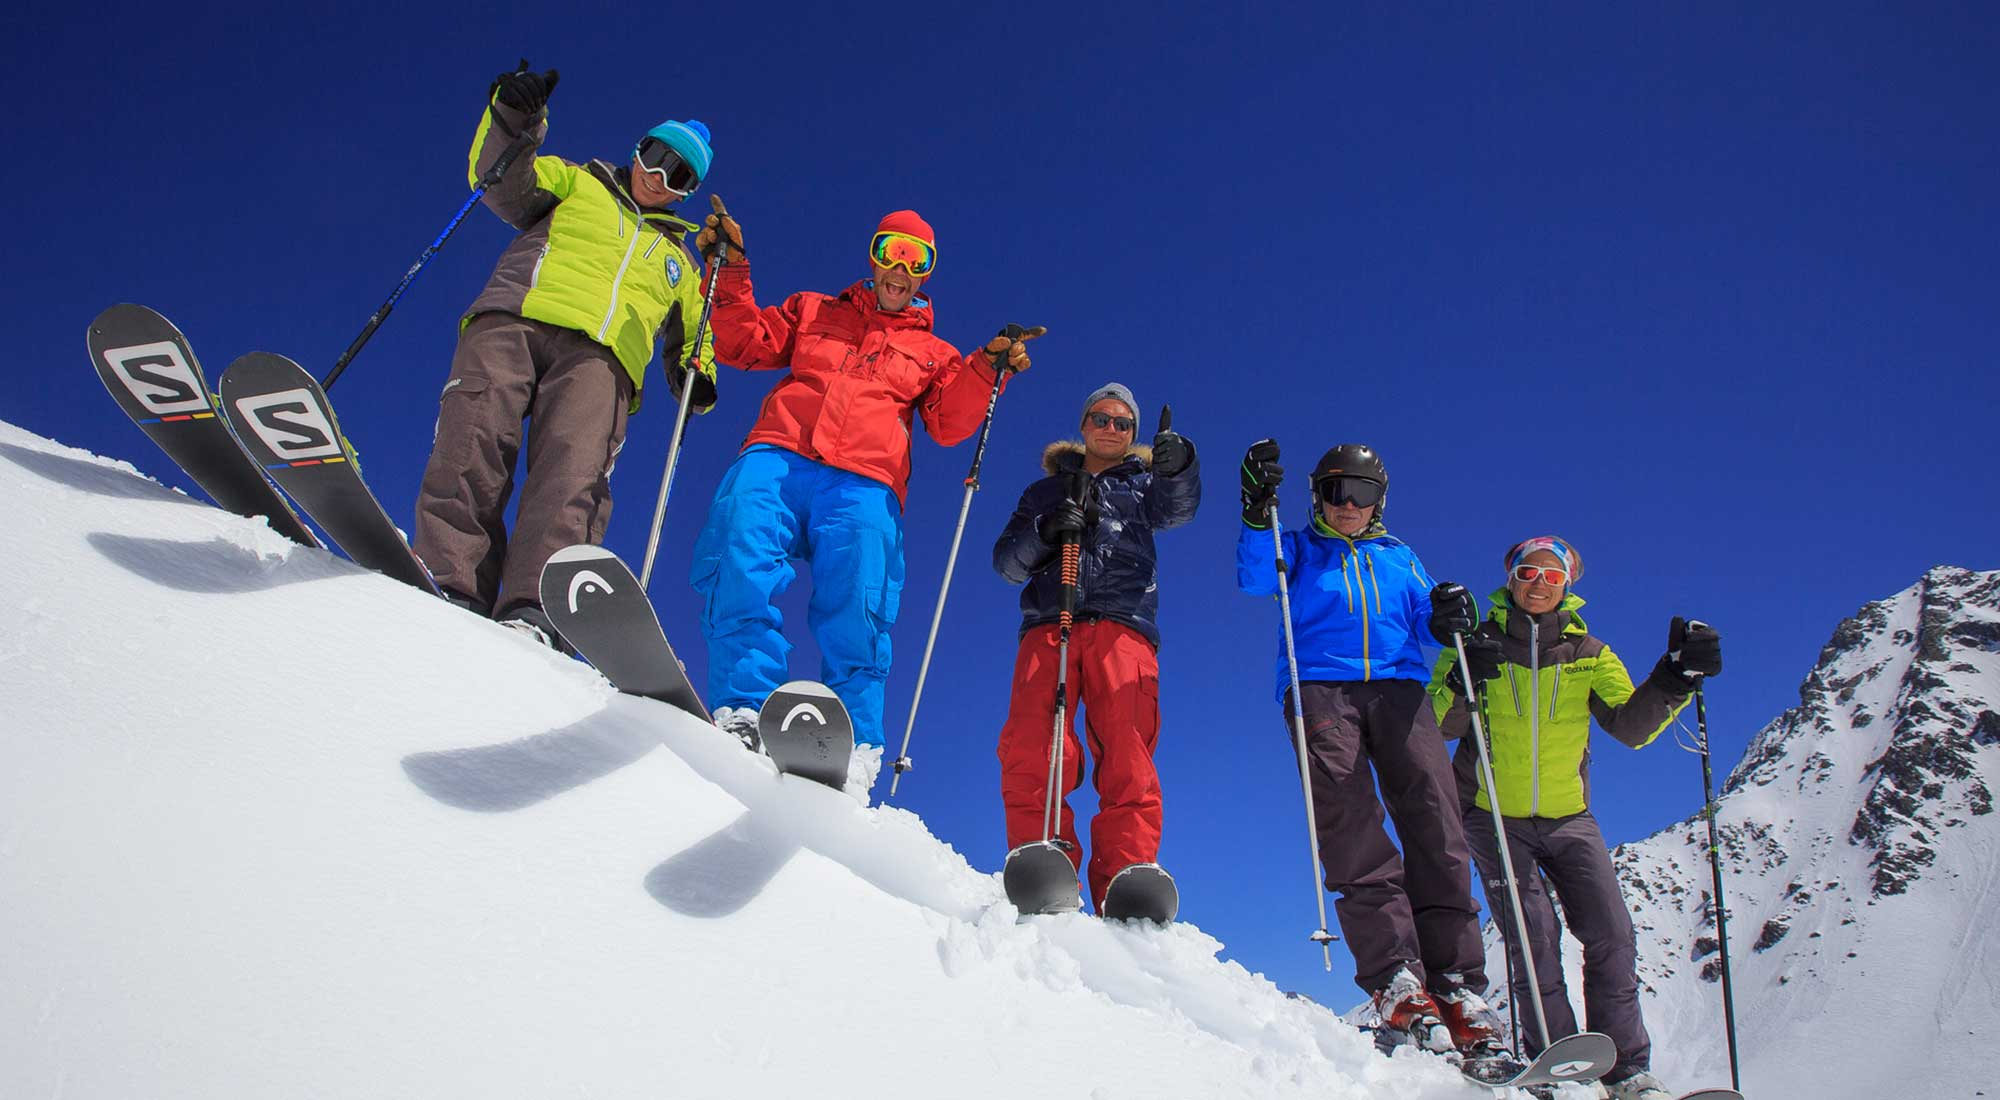 cours de ski adultes maximum 5 Prosneige